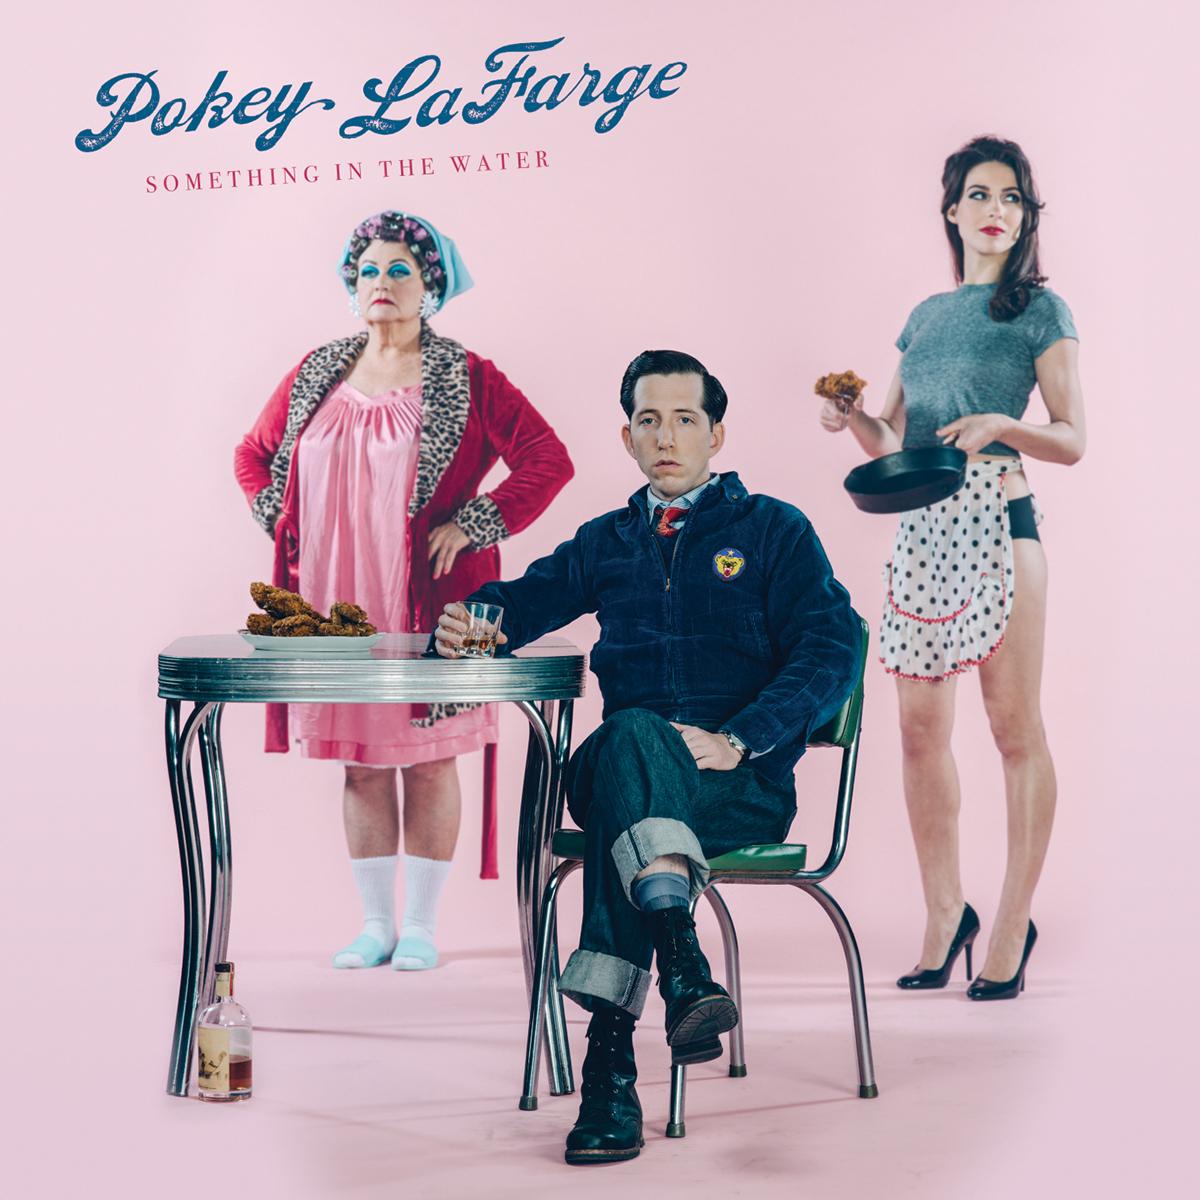 Pokey LaFarge - Something in the Water CD